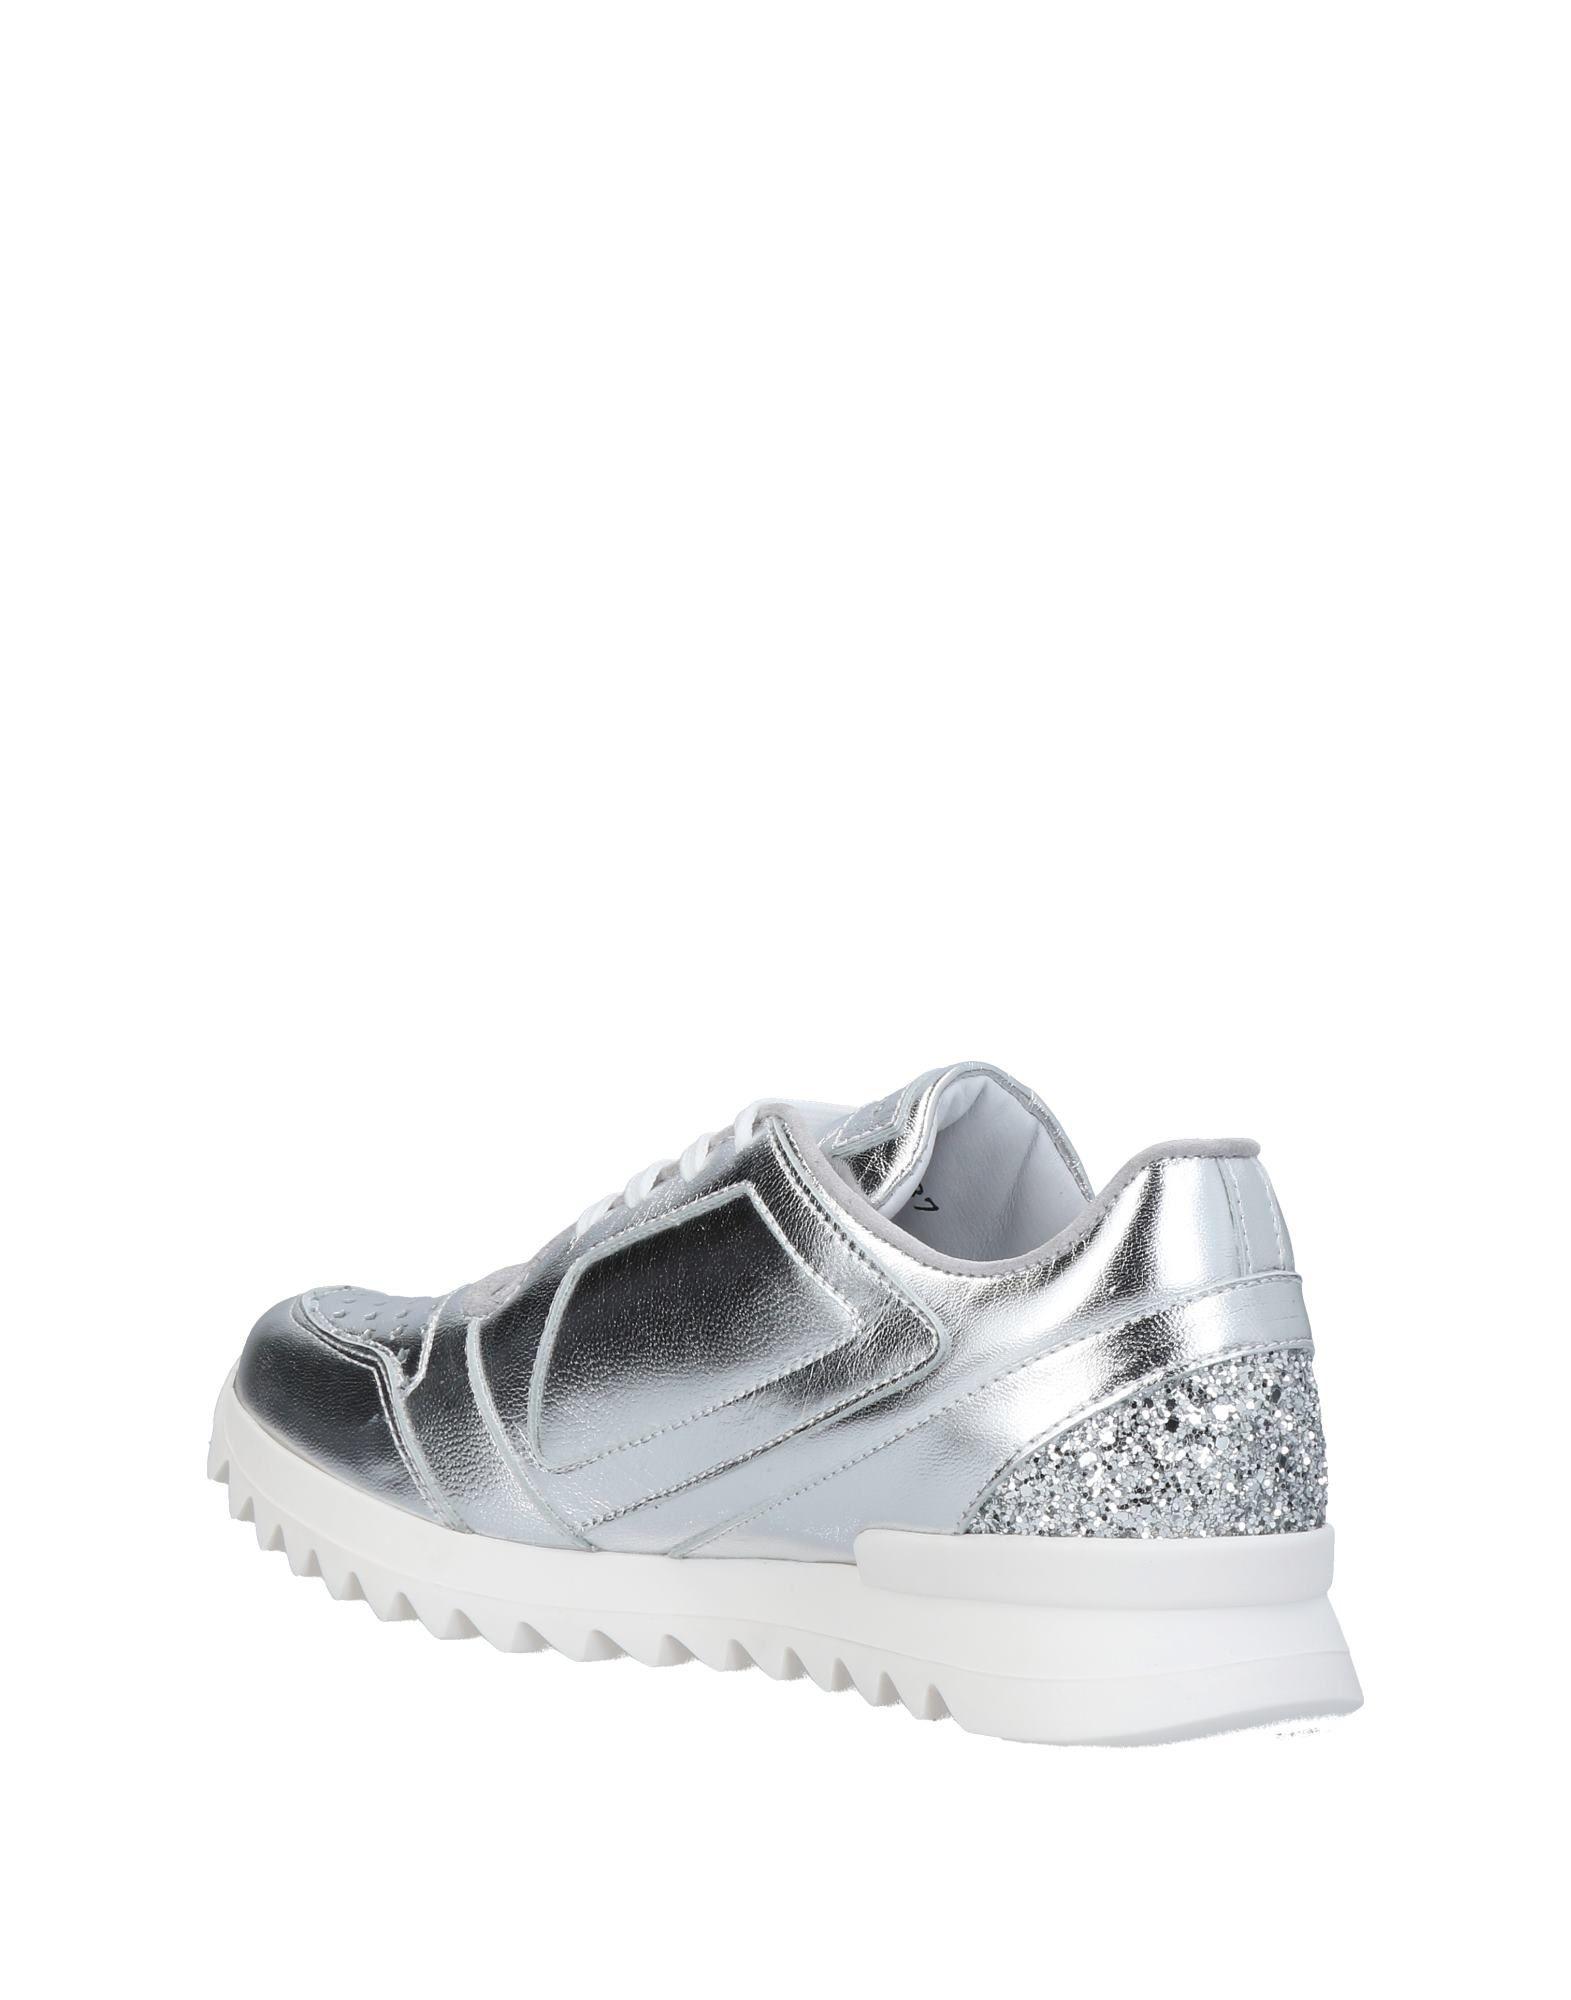 John Galliano Sneakers 11426435VR Damen  11426435VR Sneakers Neue Schuhe 0591bb